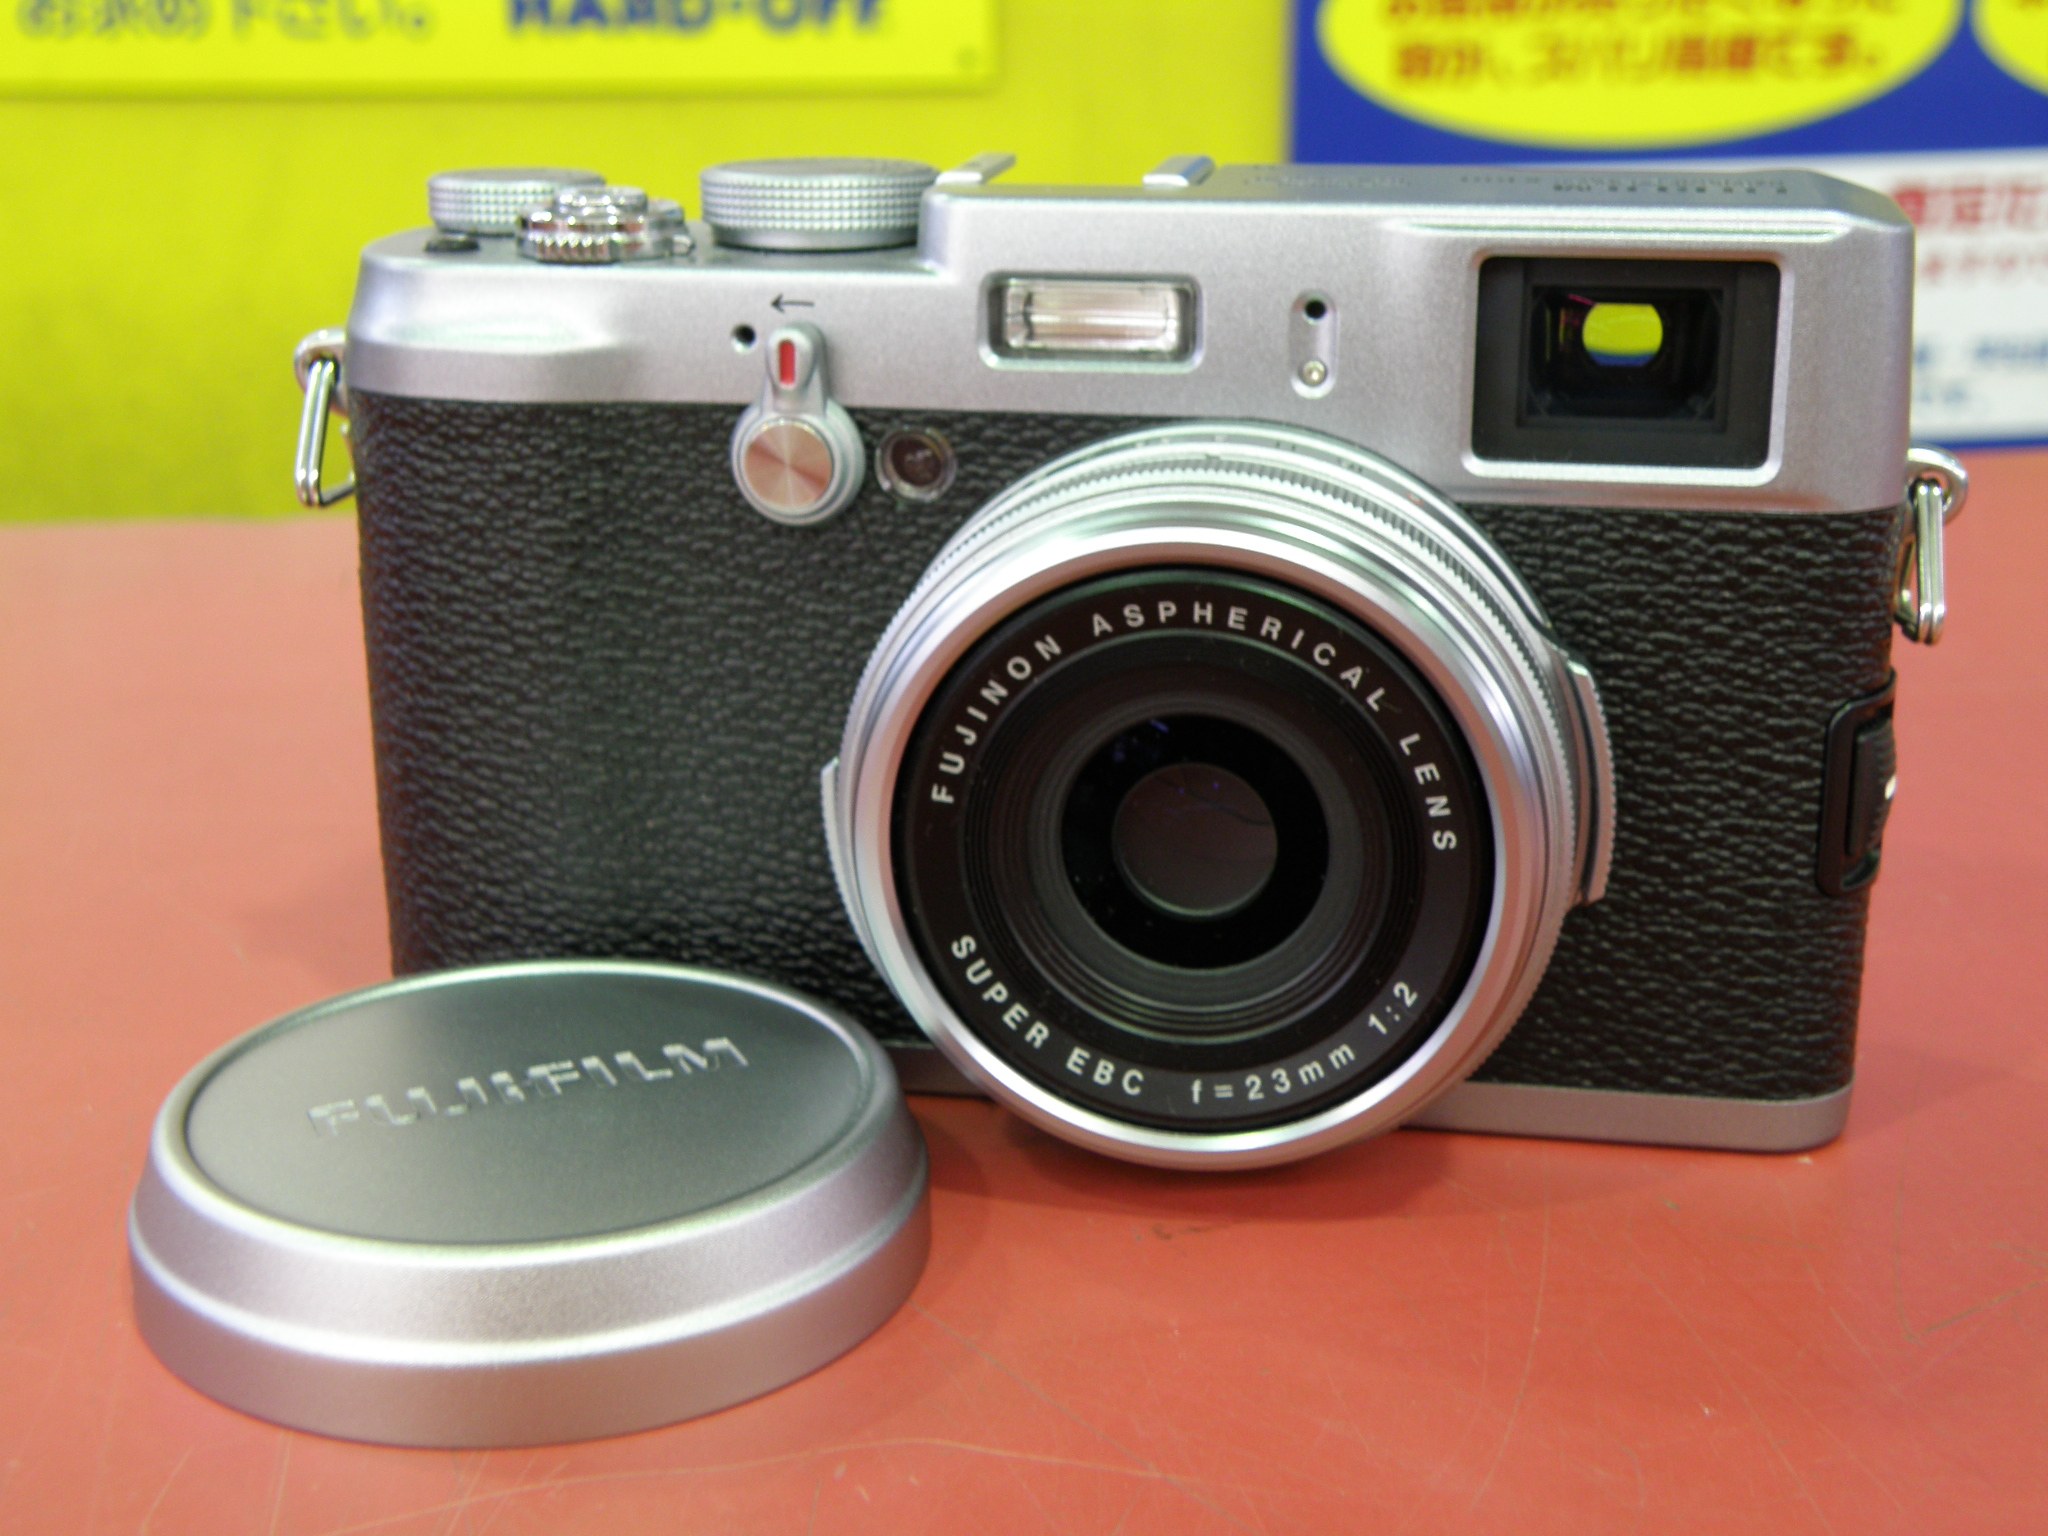 FUJIFILMデジタルカメラ買取 名古屋リサイクルショップ ハードオフ安城